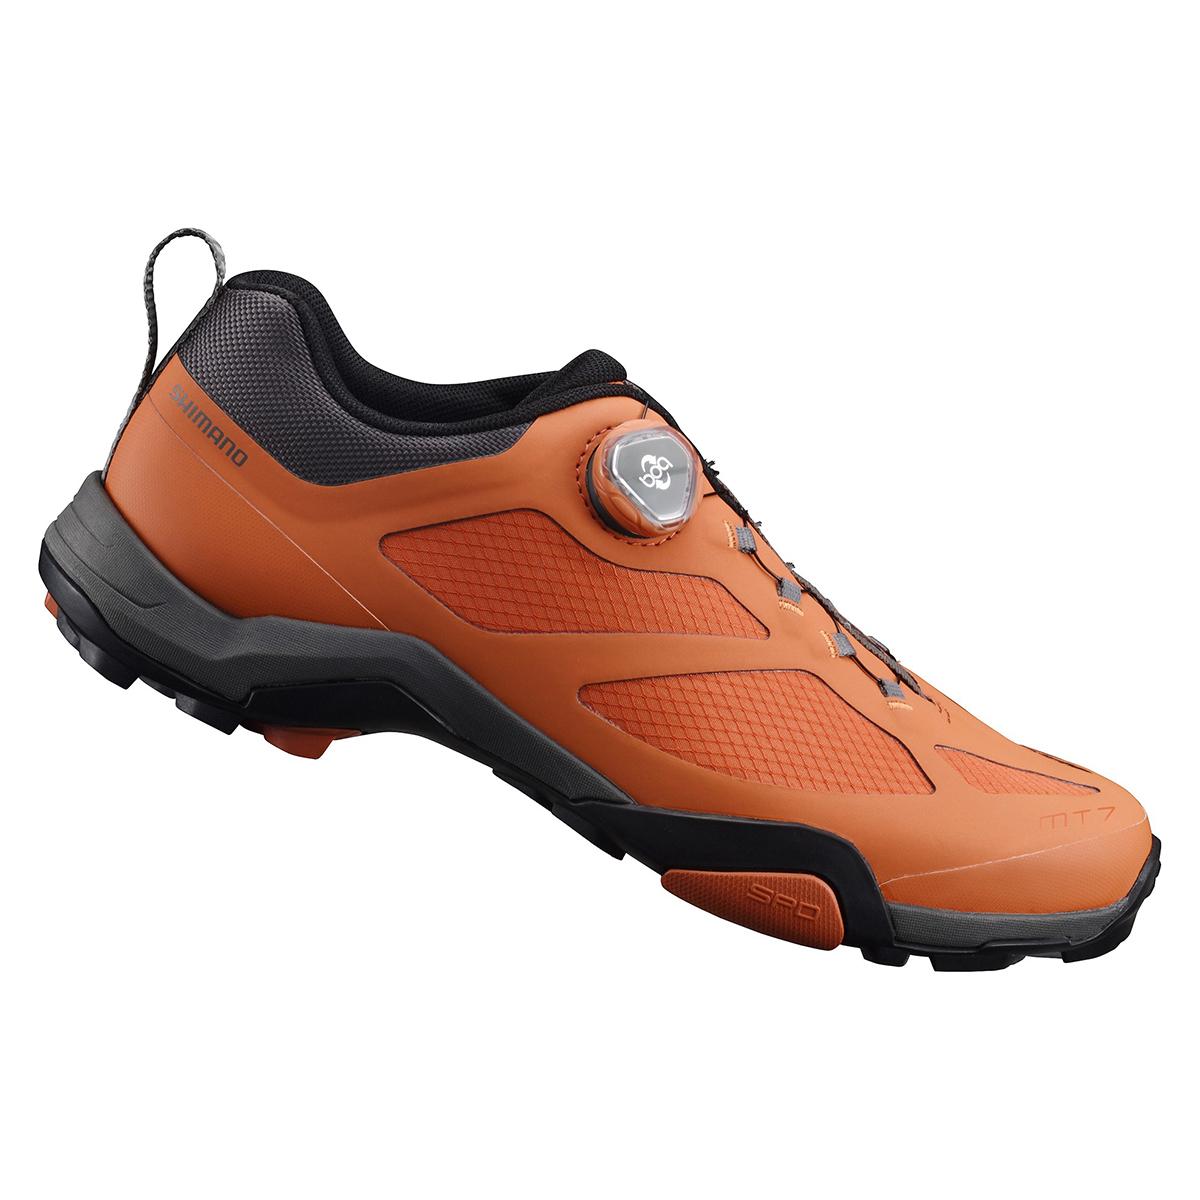 Shimano (MT7) MTB Shoe